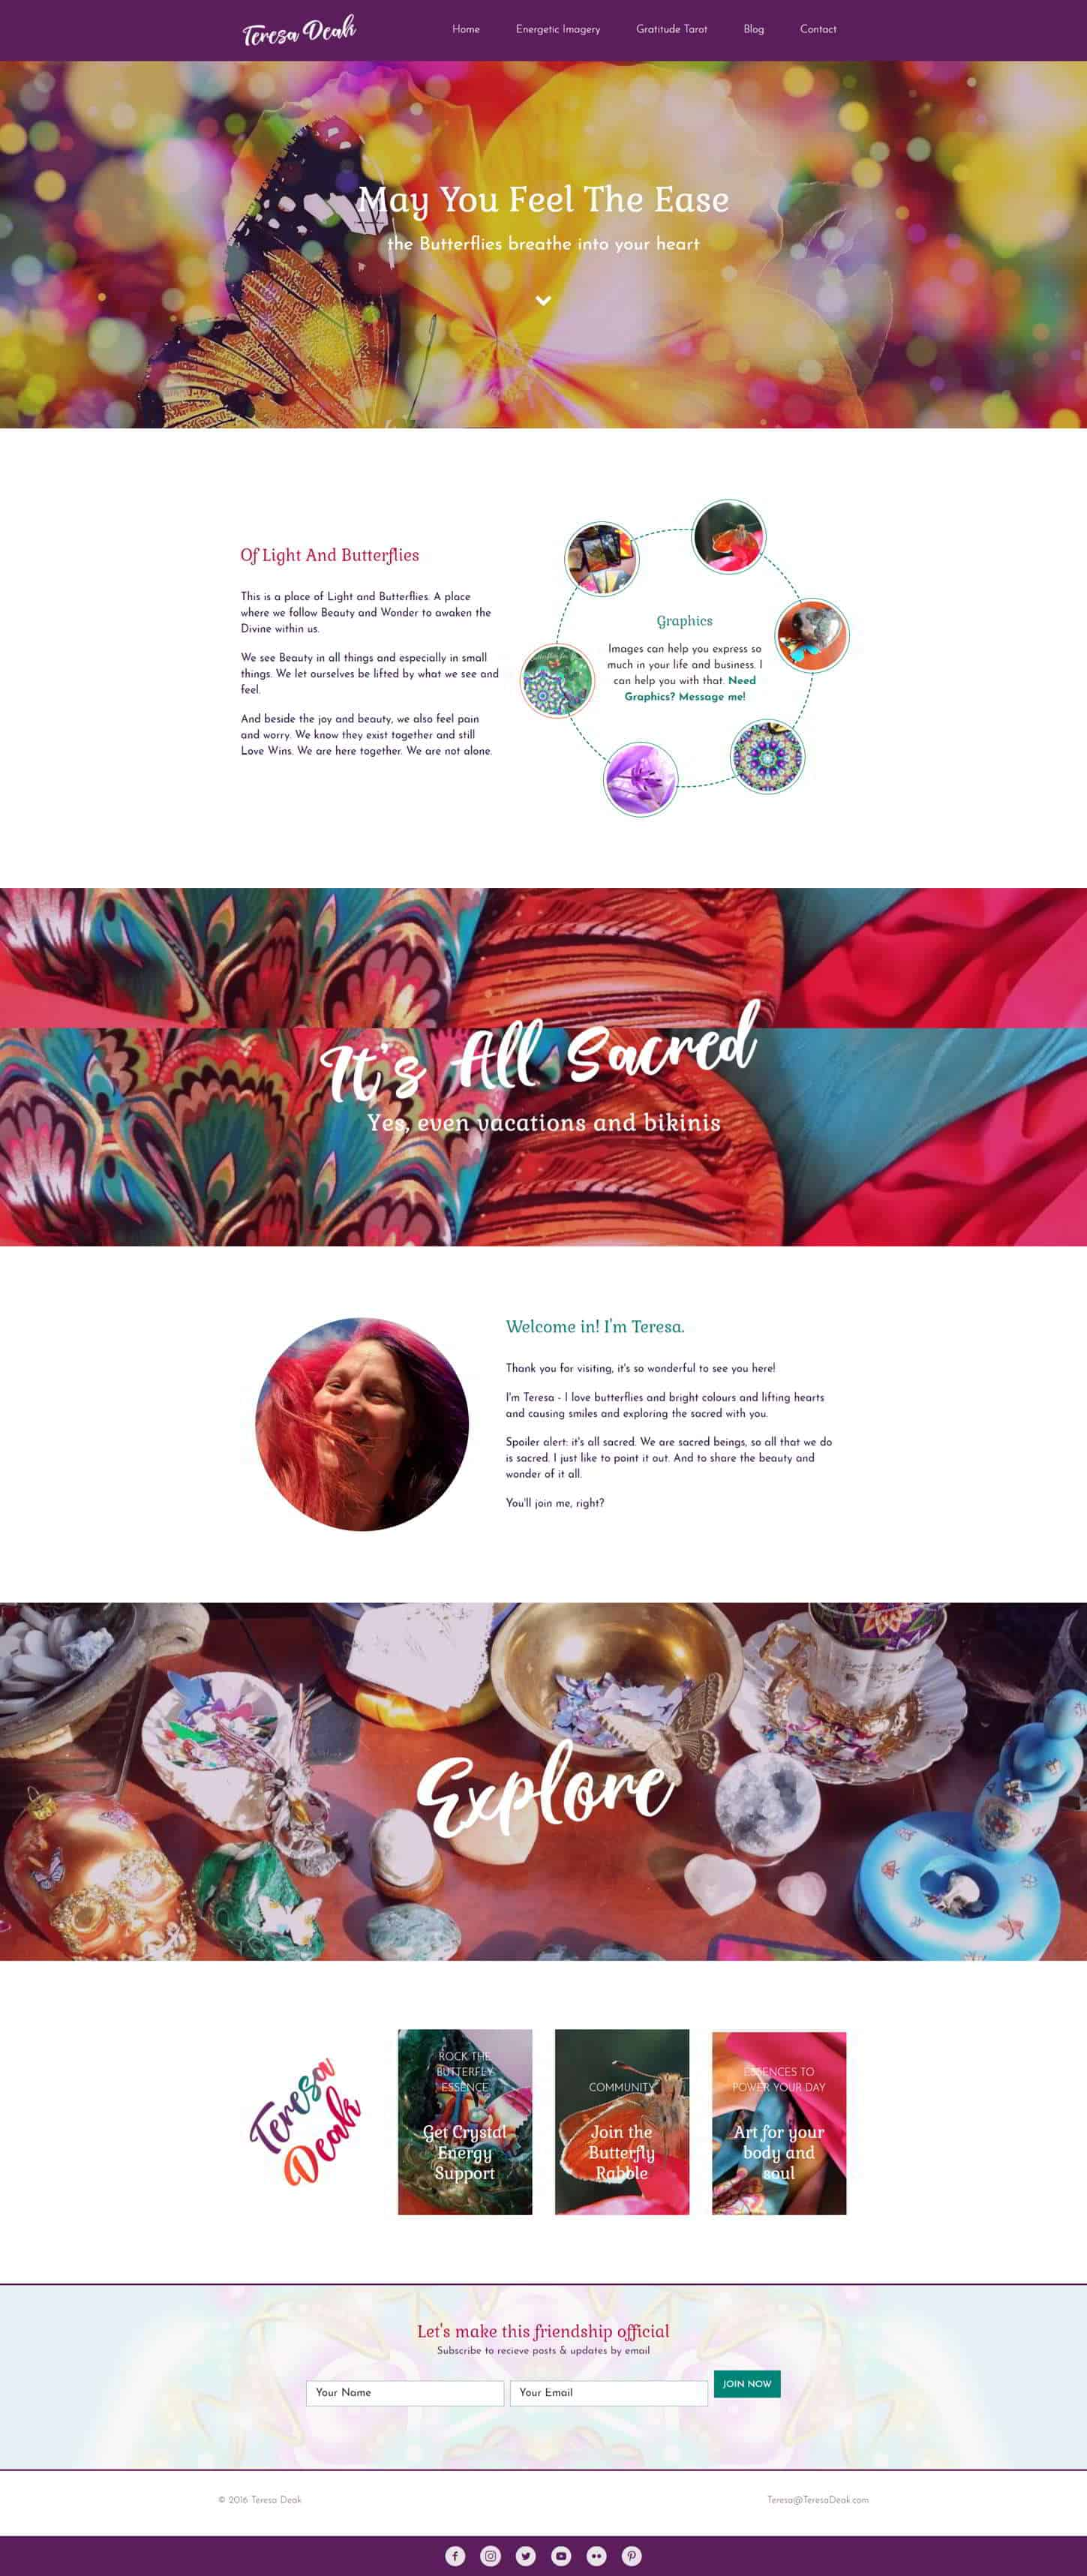 Desktop Preeview of Teresa Deak Website